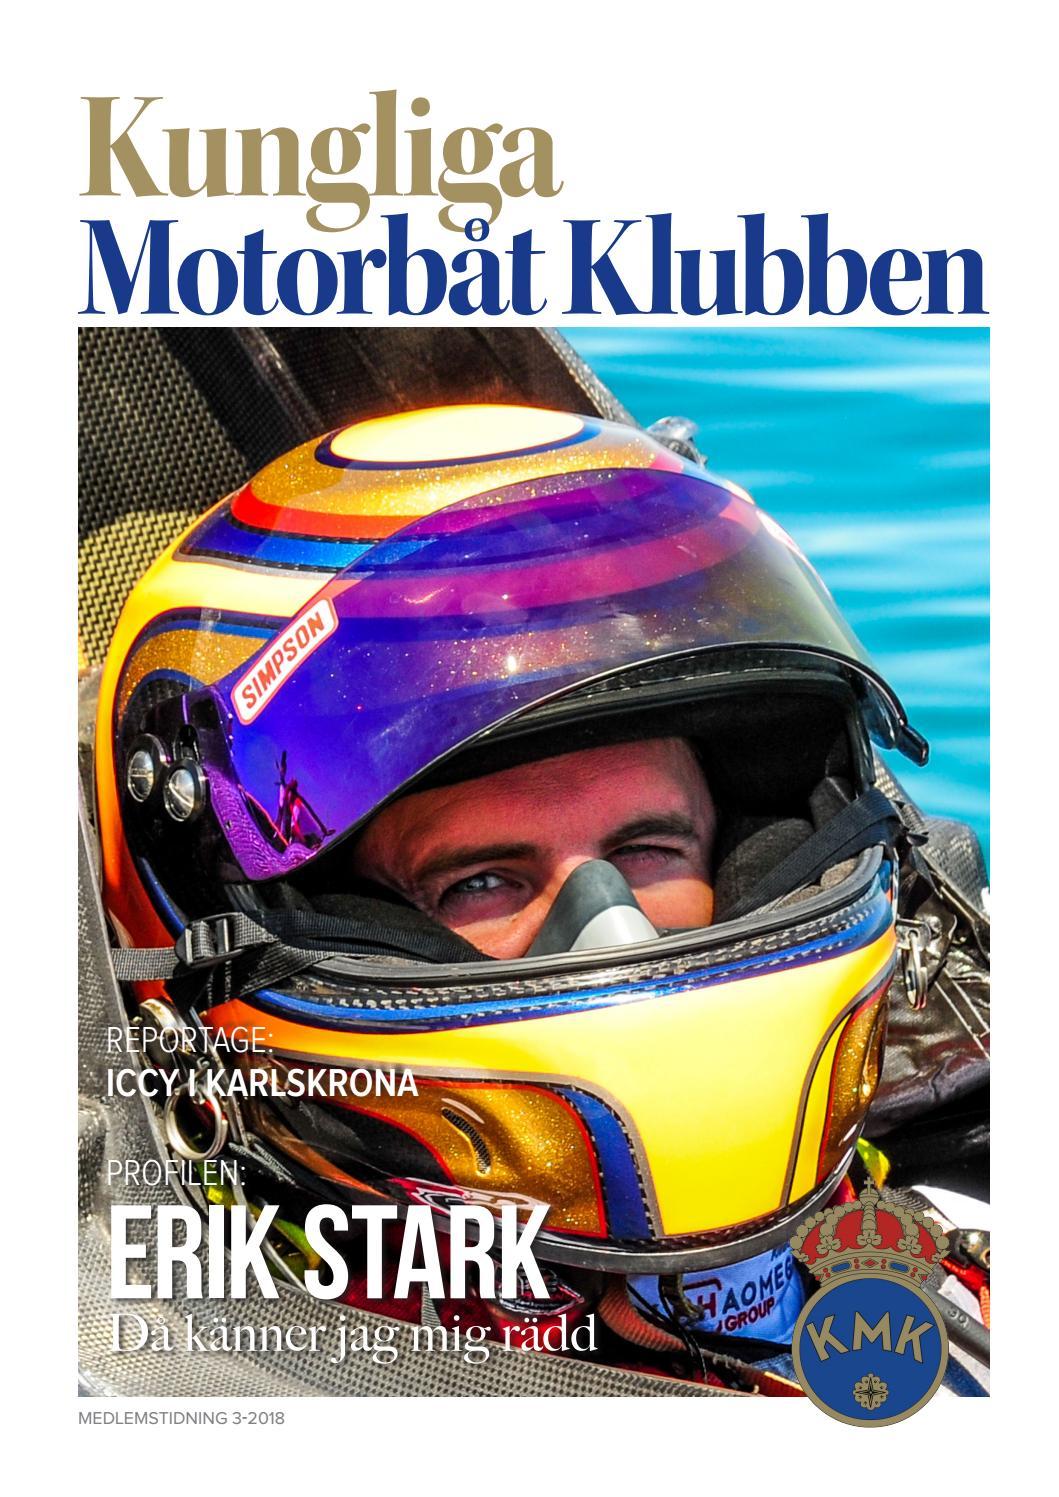 Kungliga Motorbåt Klubben 1803 by Newsfactory Media Group - issuu 9fcc24ae8441b